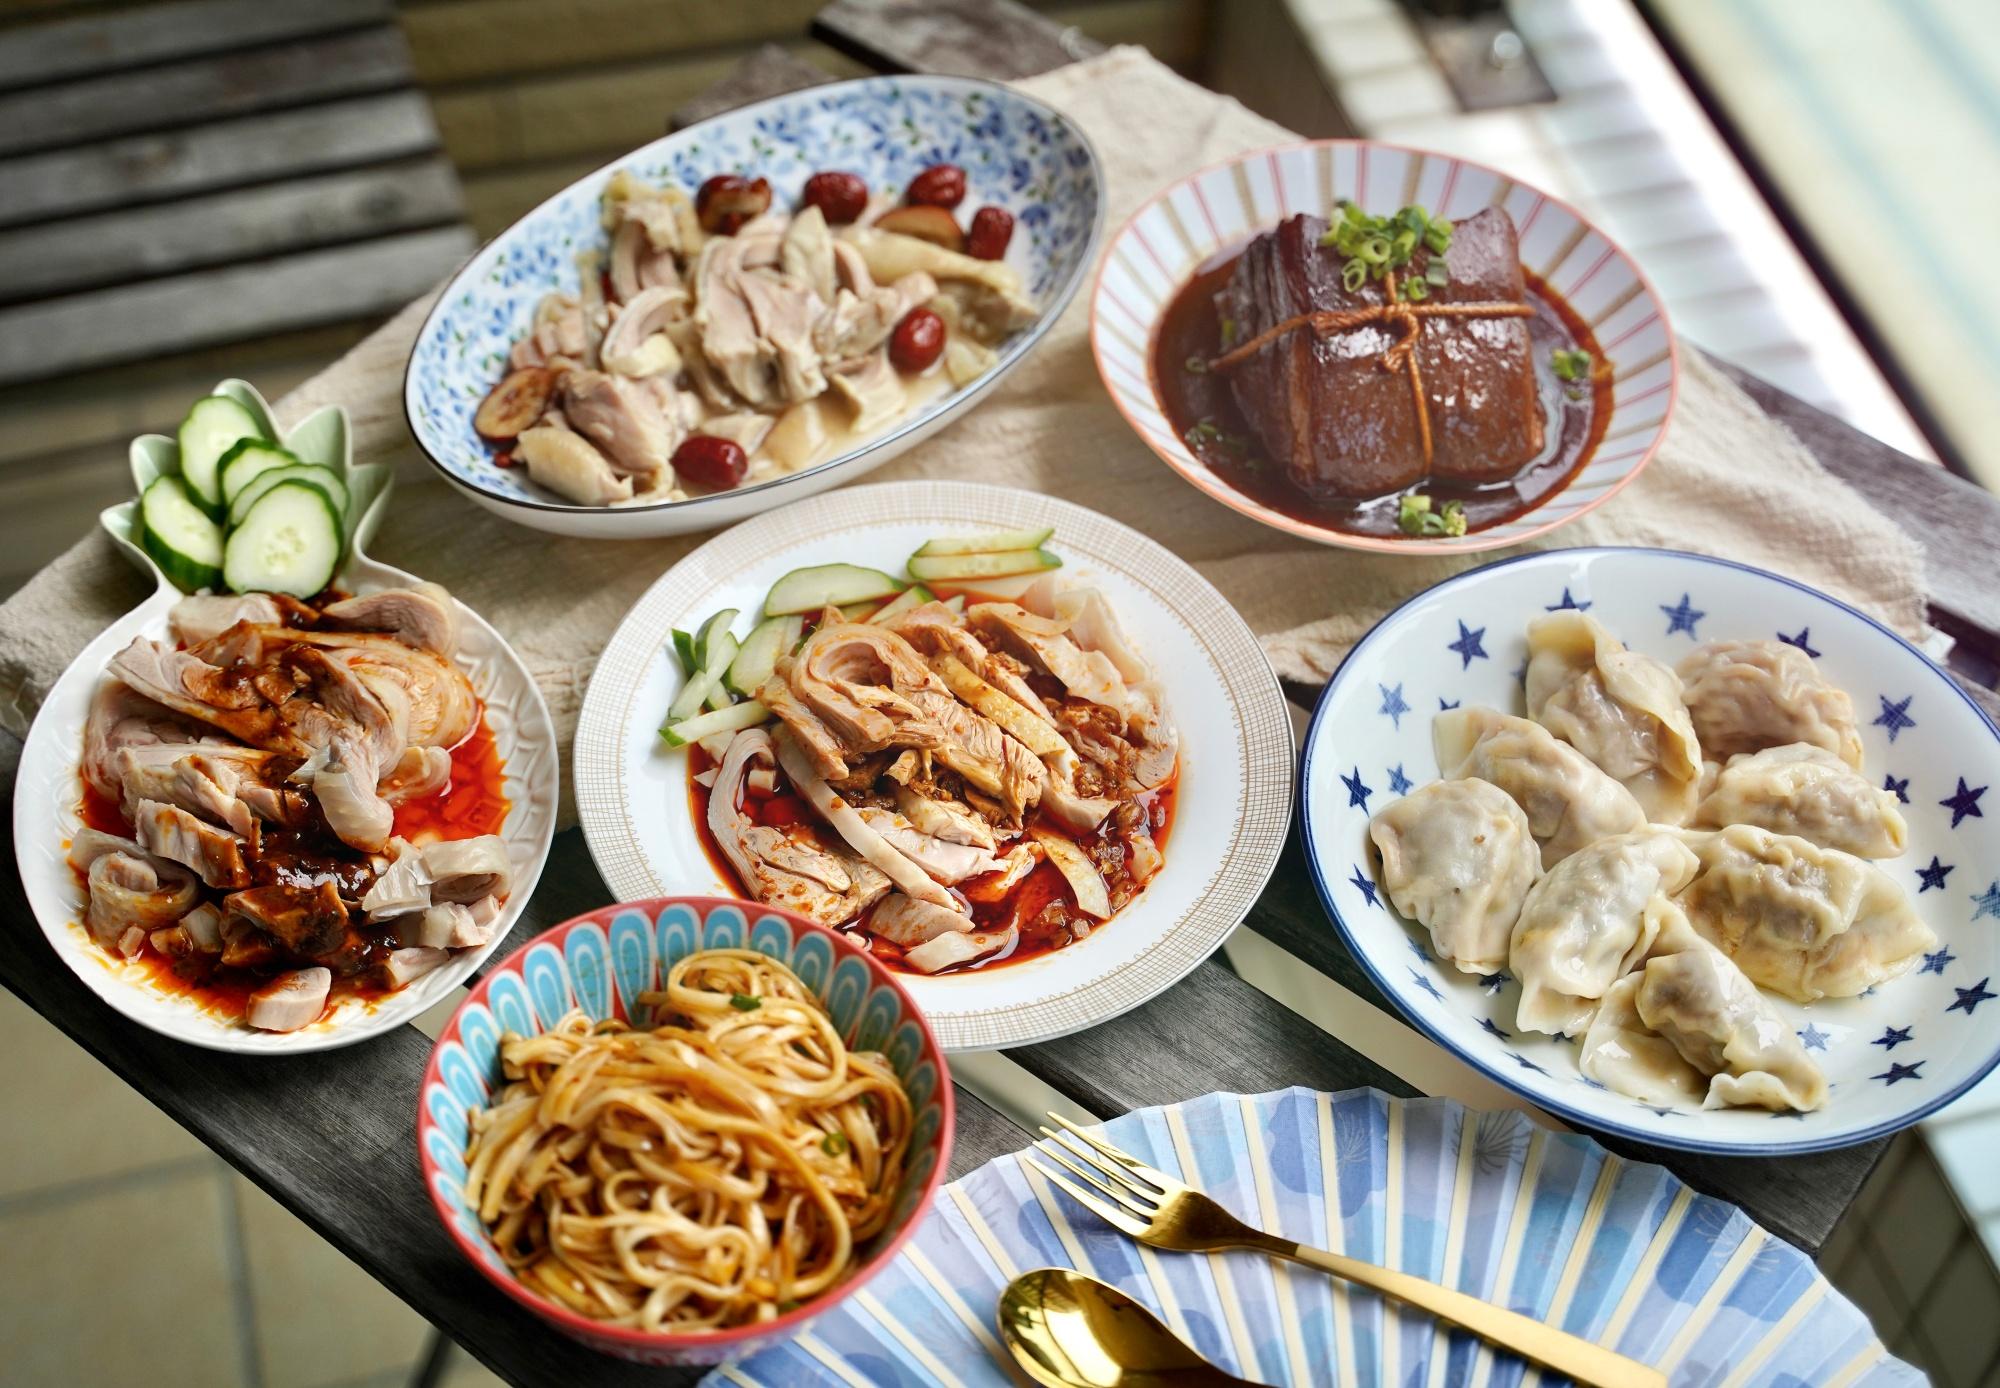 Old Seat Restaurant.Cafe 川酒&咖啡|Old Seat 冷凍美食宅配外帶|Old Seat 川酒館外送外帶(菜單、價格)